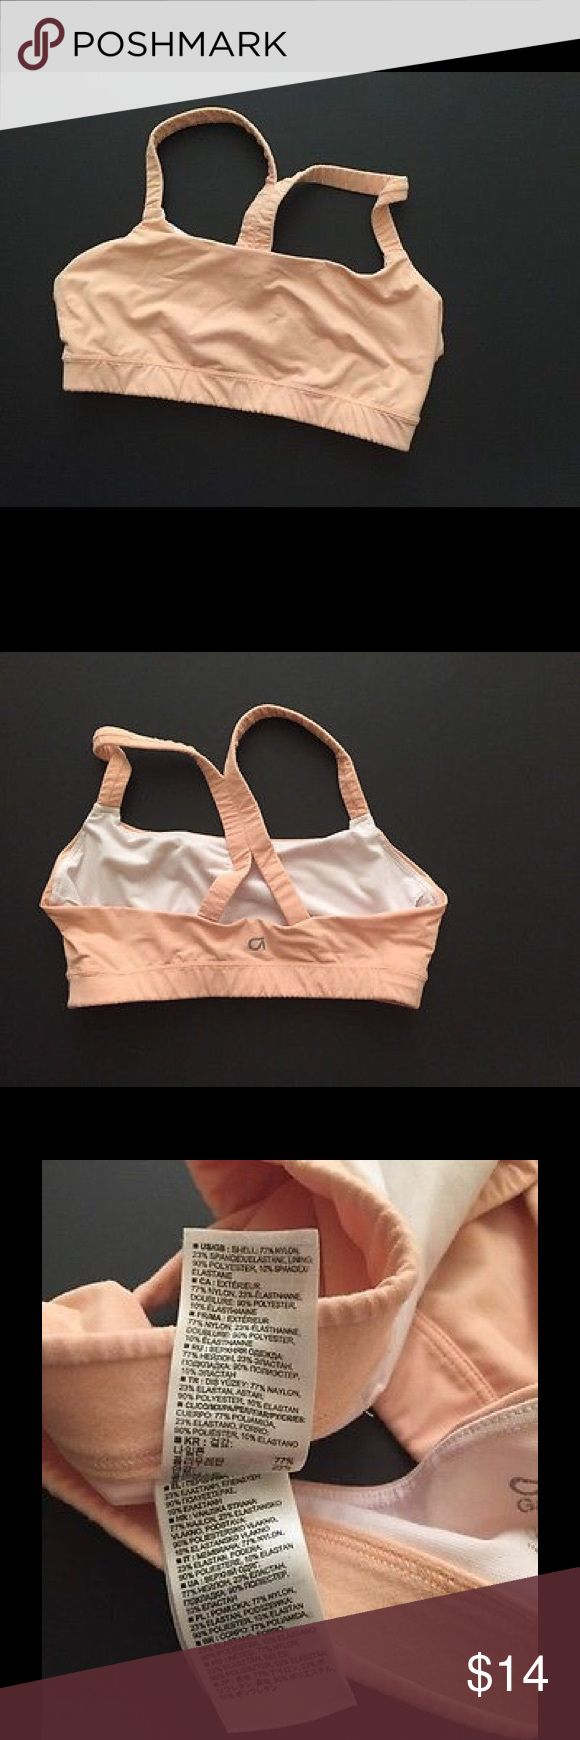 GAP fit low impact nude sports bra medium Great condition GAP Intimates & Sleepwear Bras